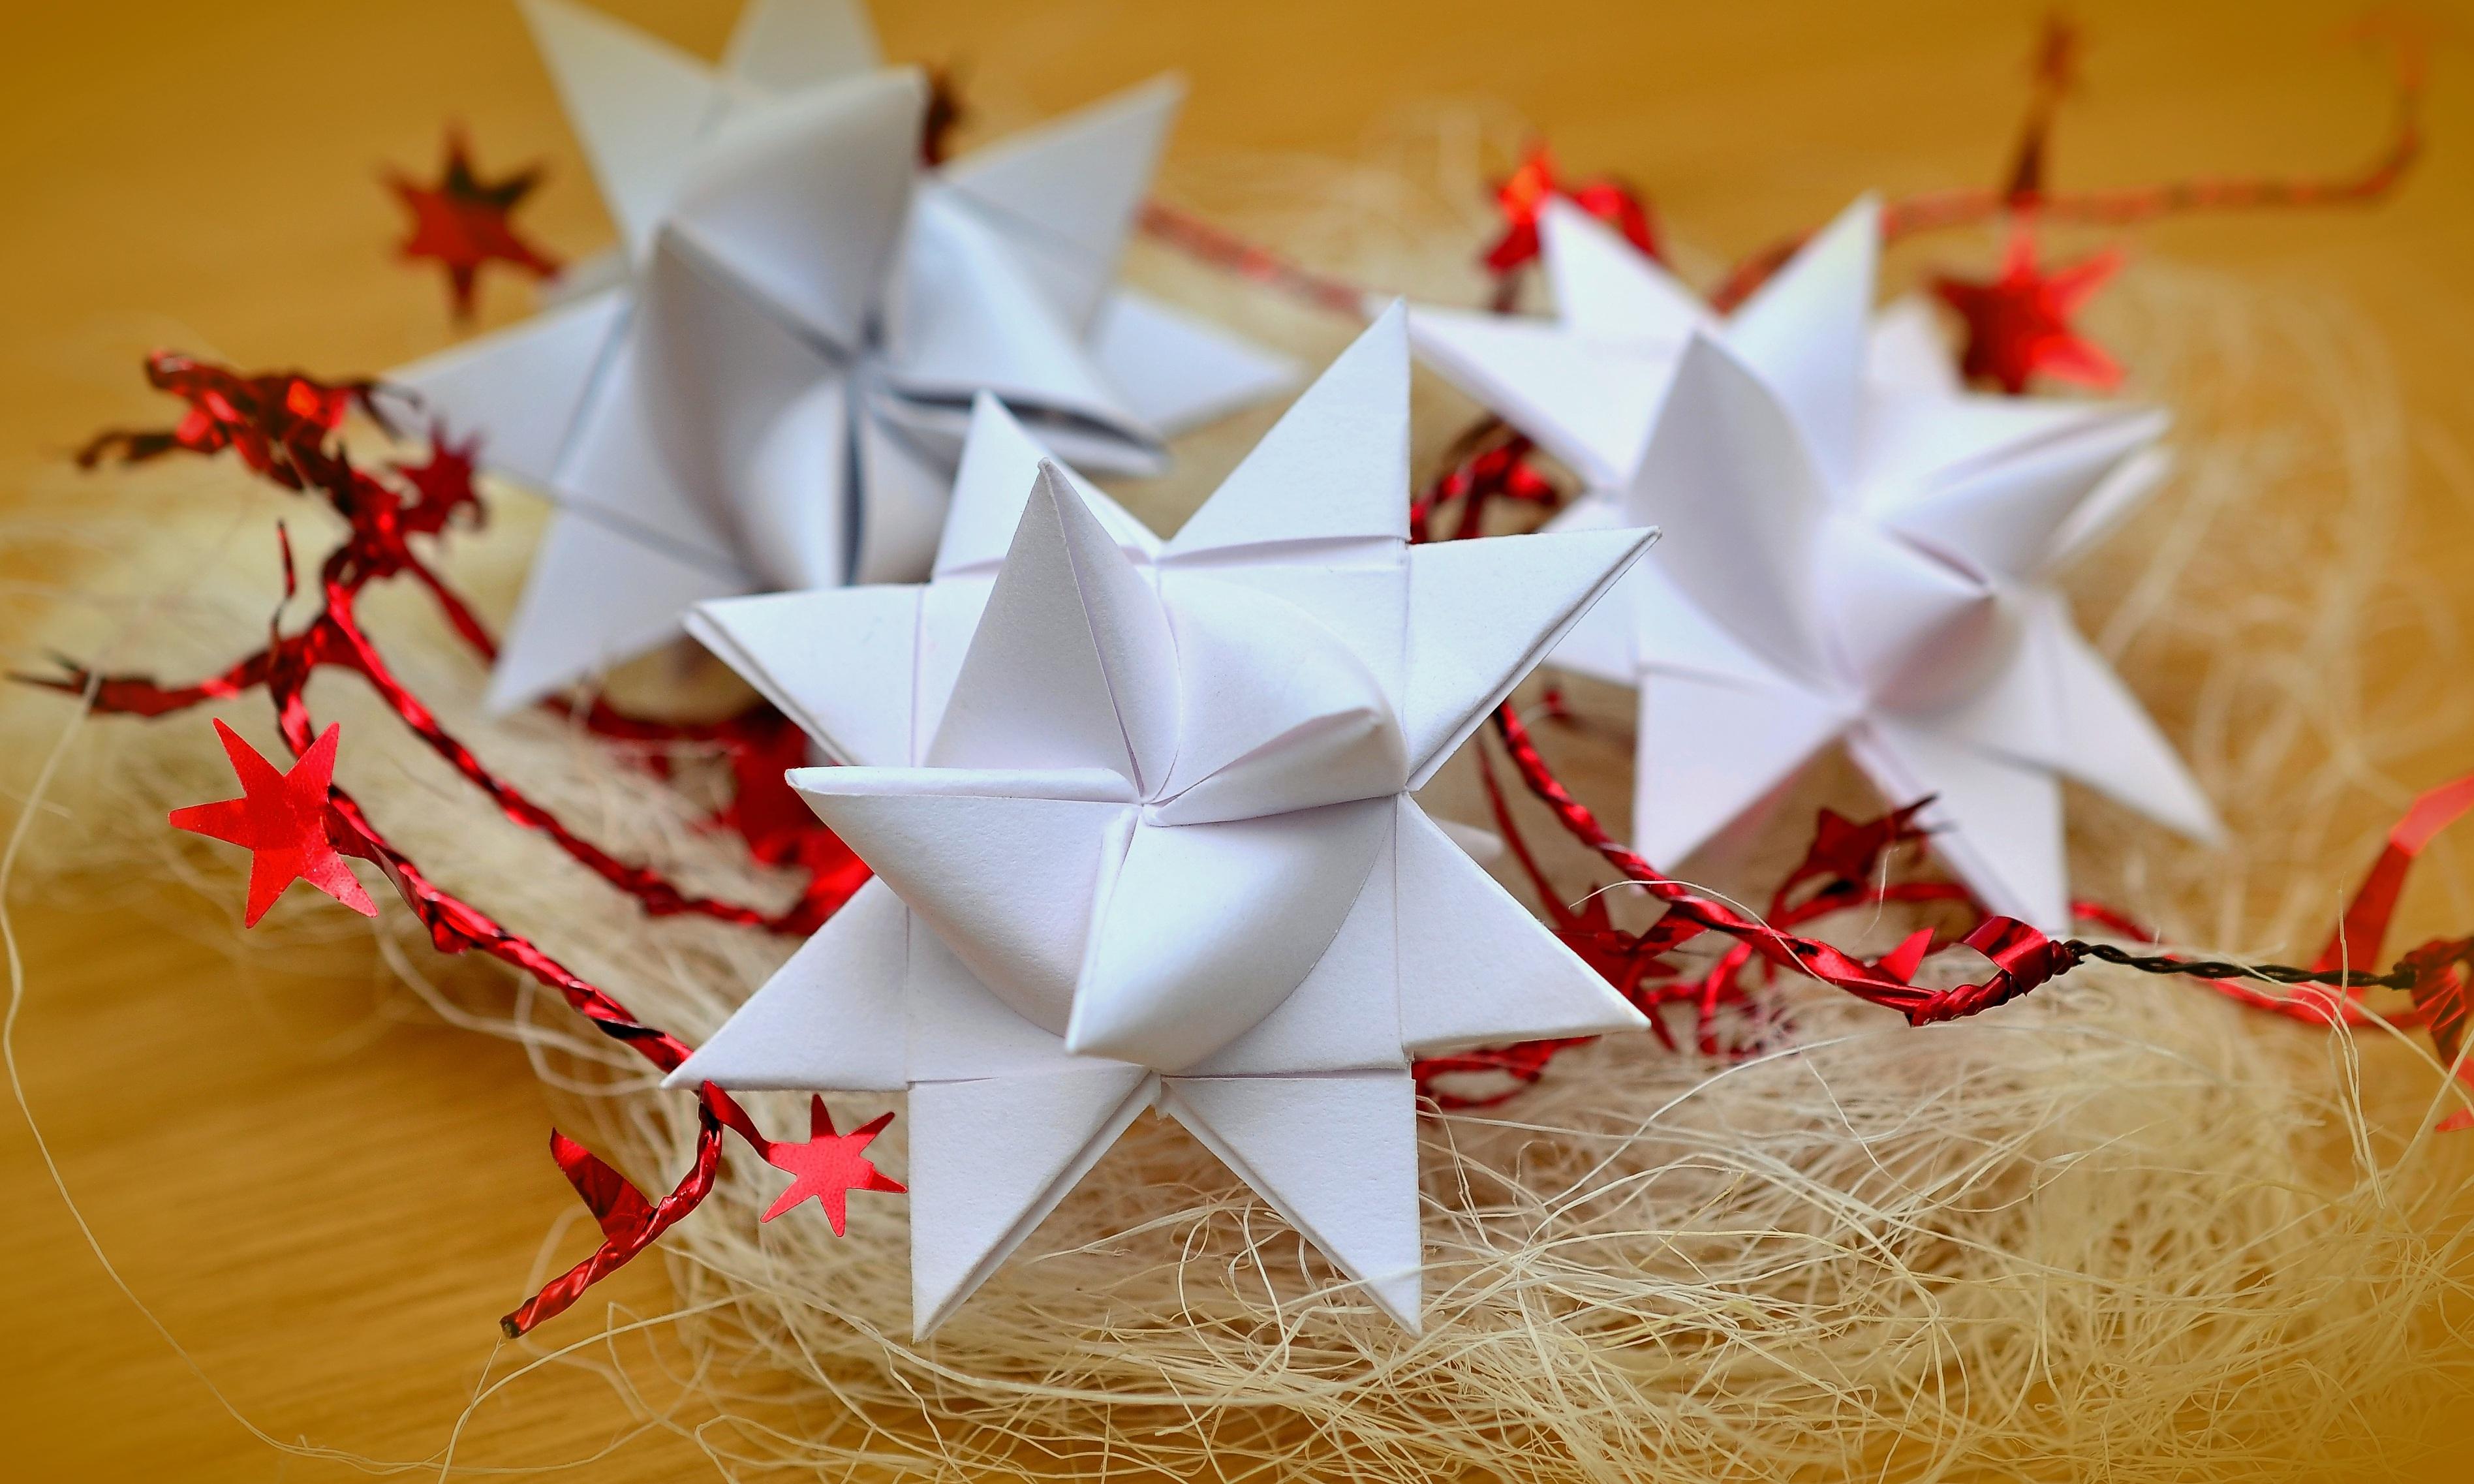 Free Images Wheel Star Flower Petal Christmas Decoration Art